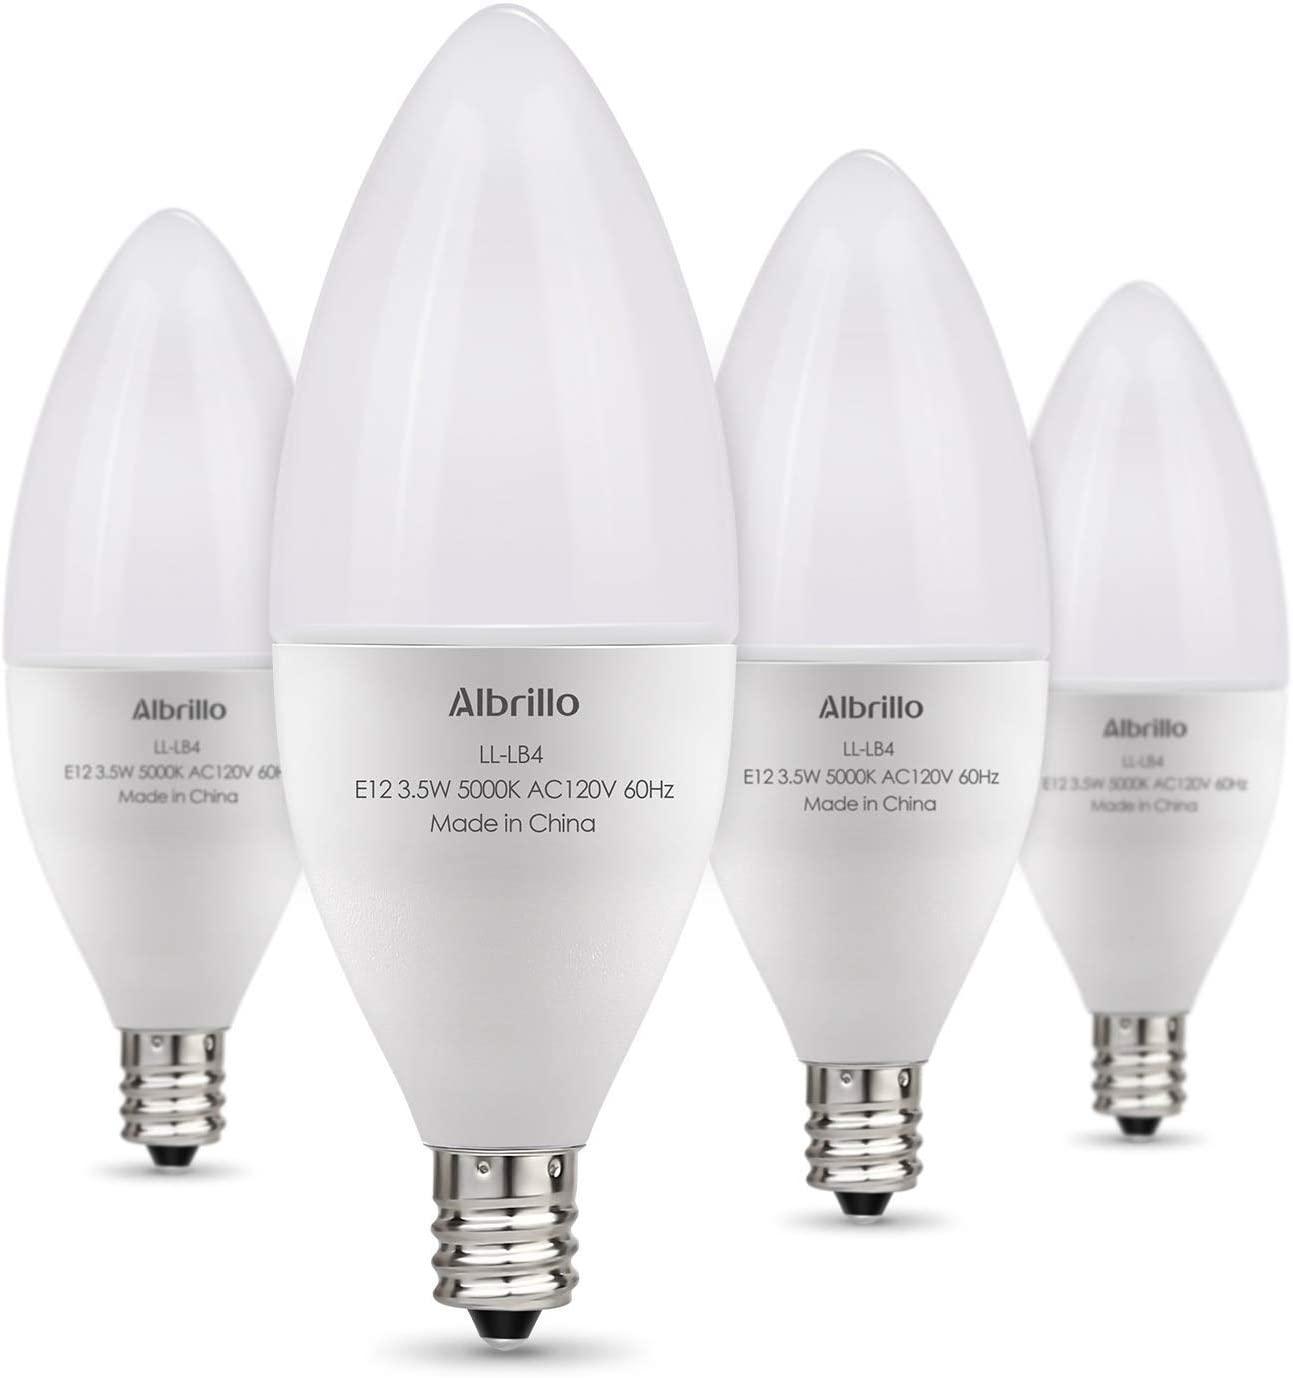 E12 LED Bulb - Albrillo Daylight White Ceiling Fan Light Bulbs, Small Base Chandelier Lights Non Dimmable, 4 Pack